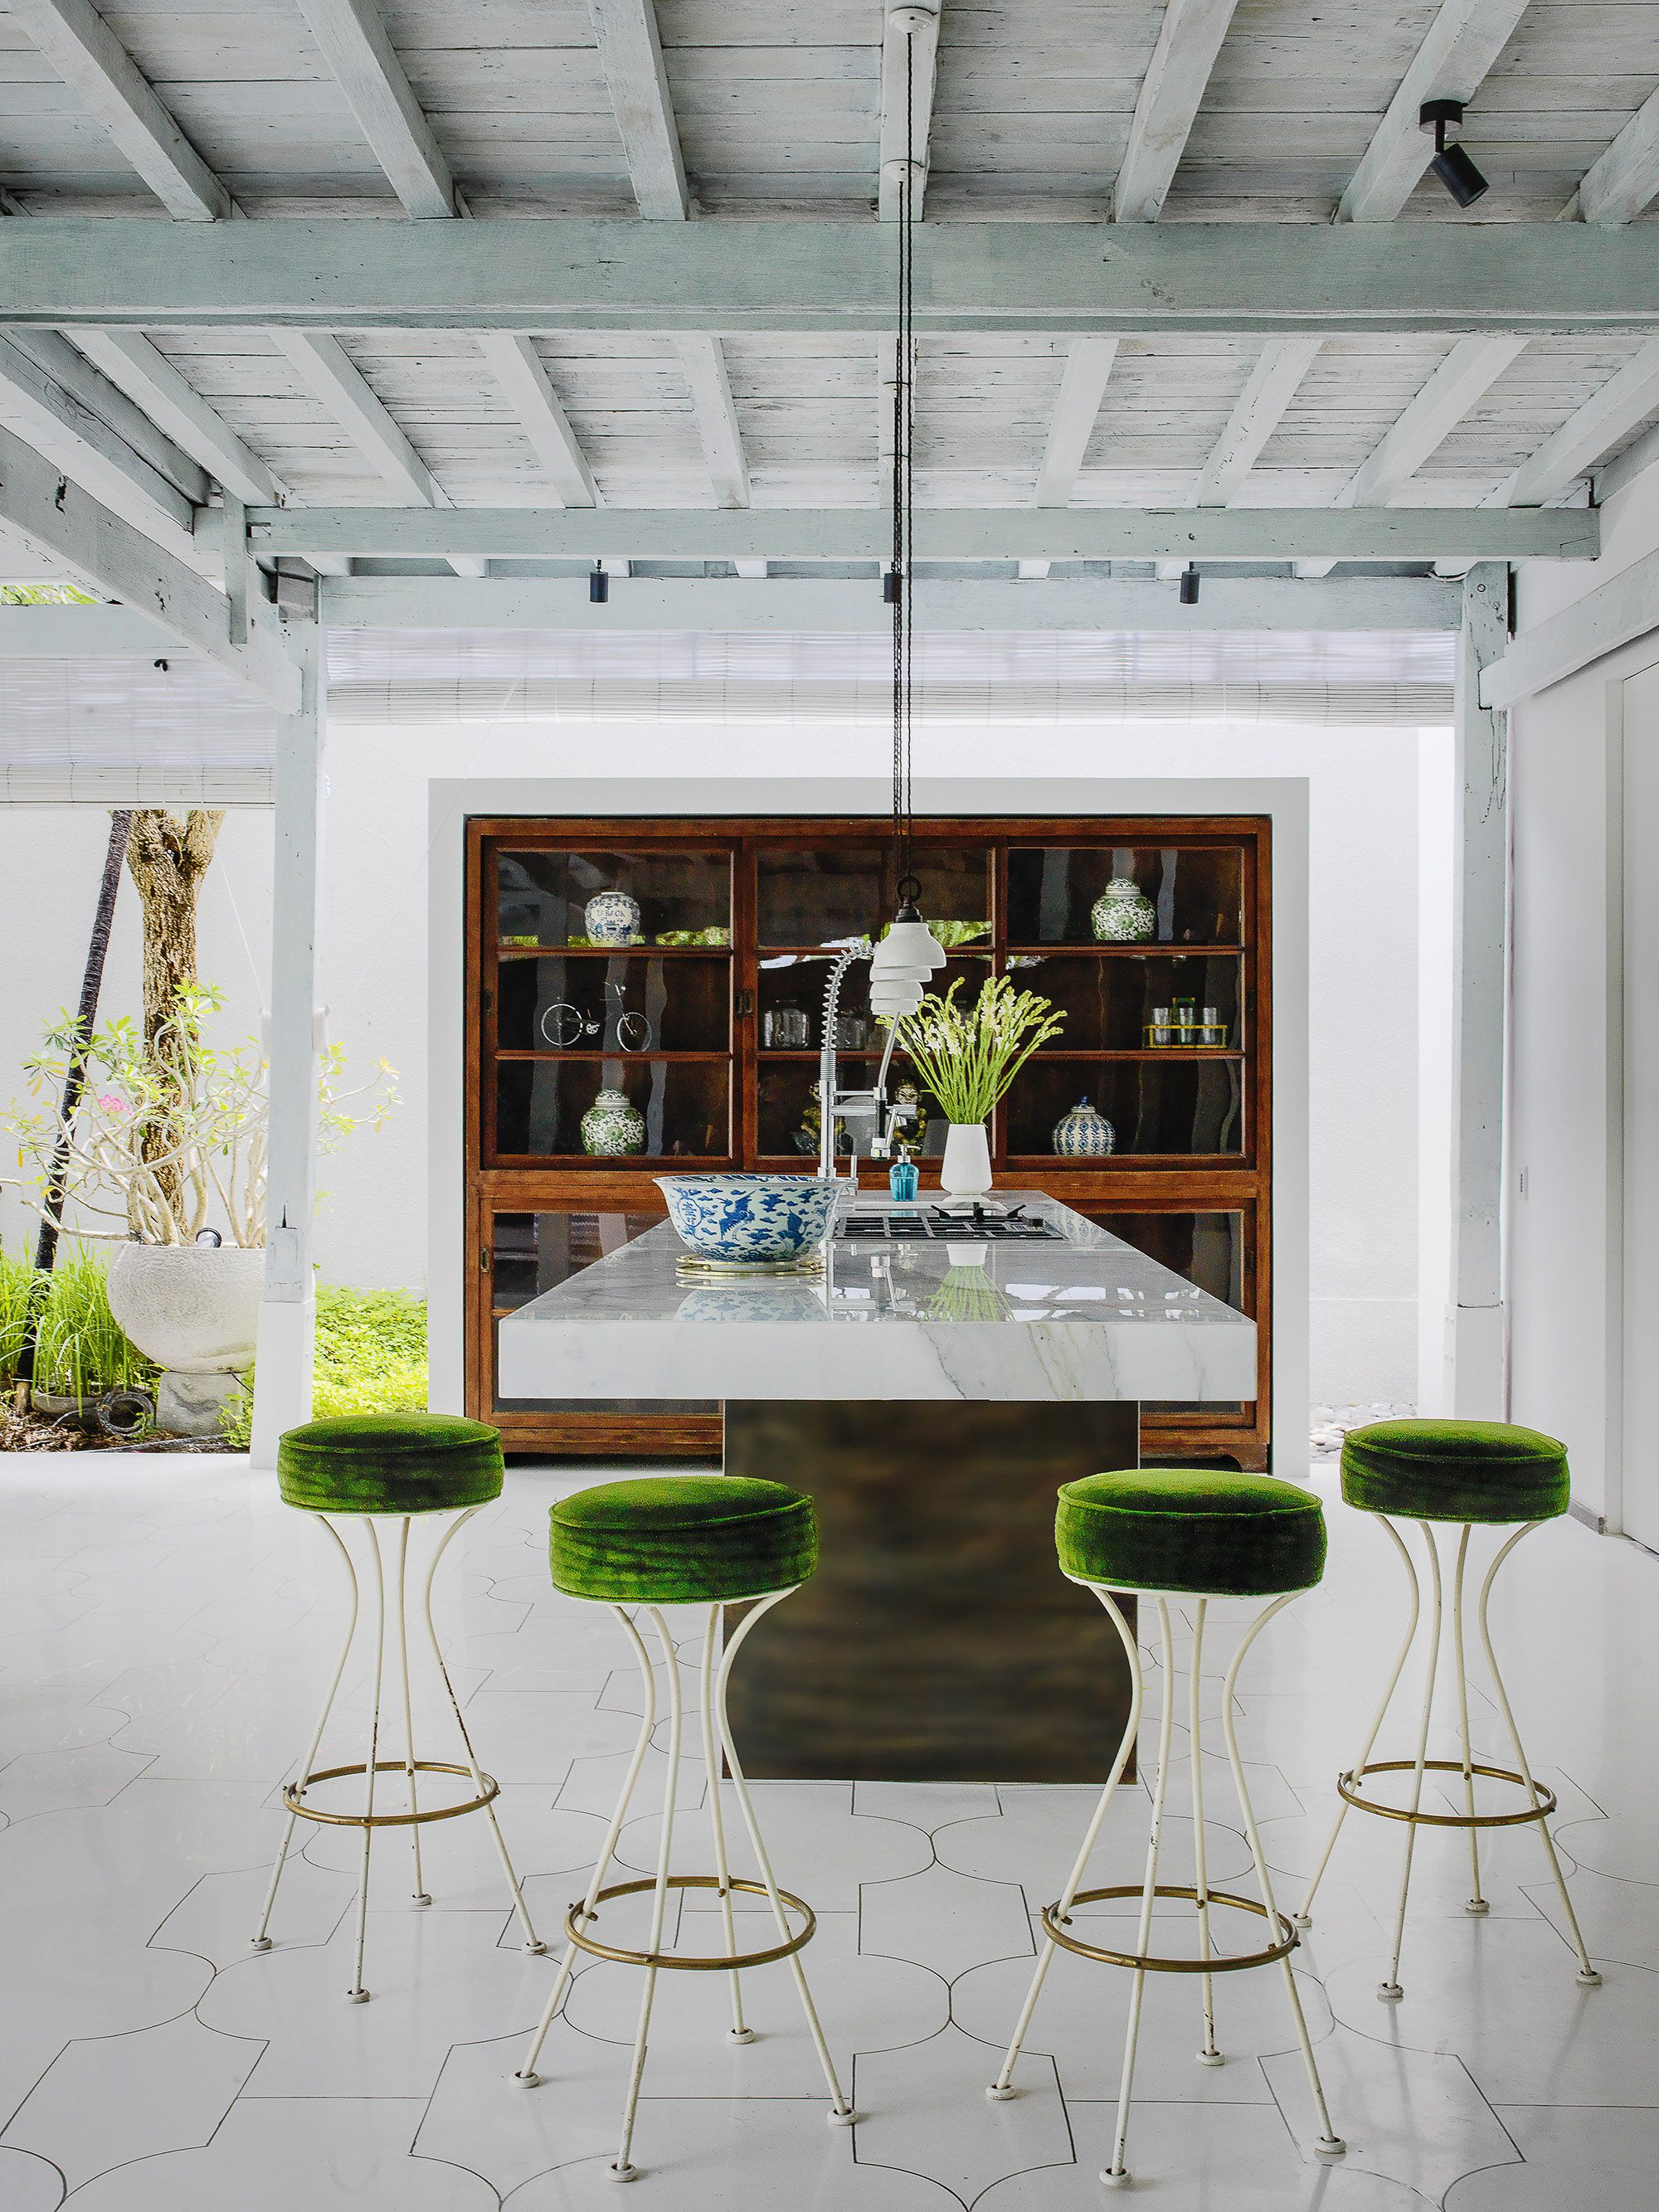 Villa enchanting outdoor kitchen interior decorating mansion home decoration also  decor rh pinterest